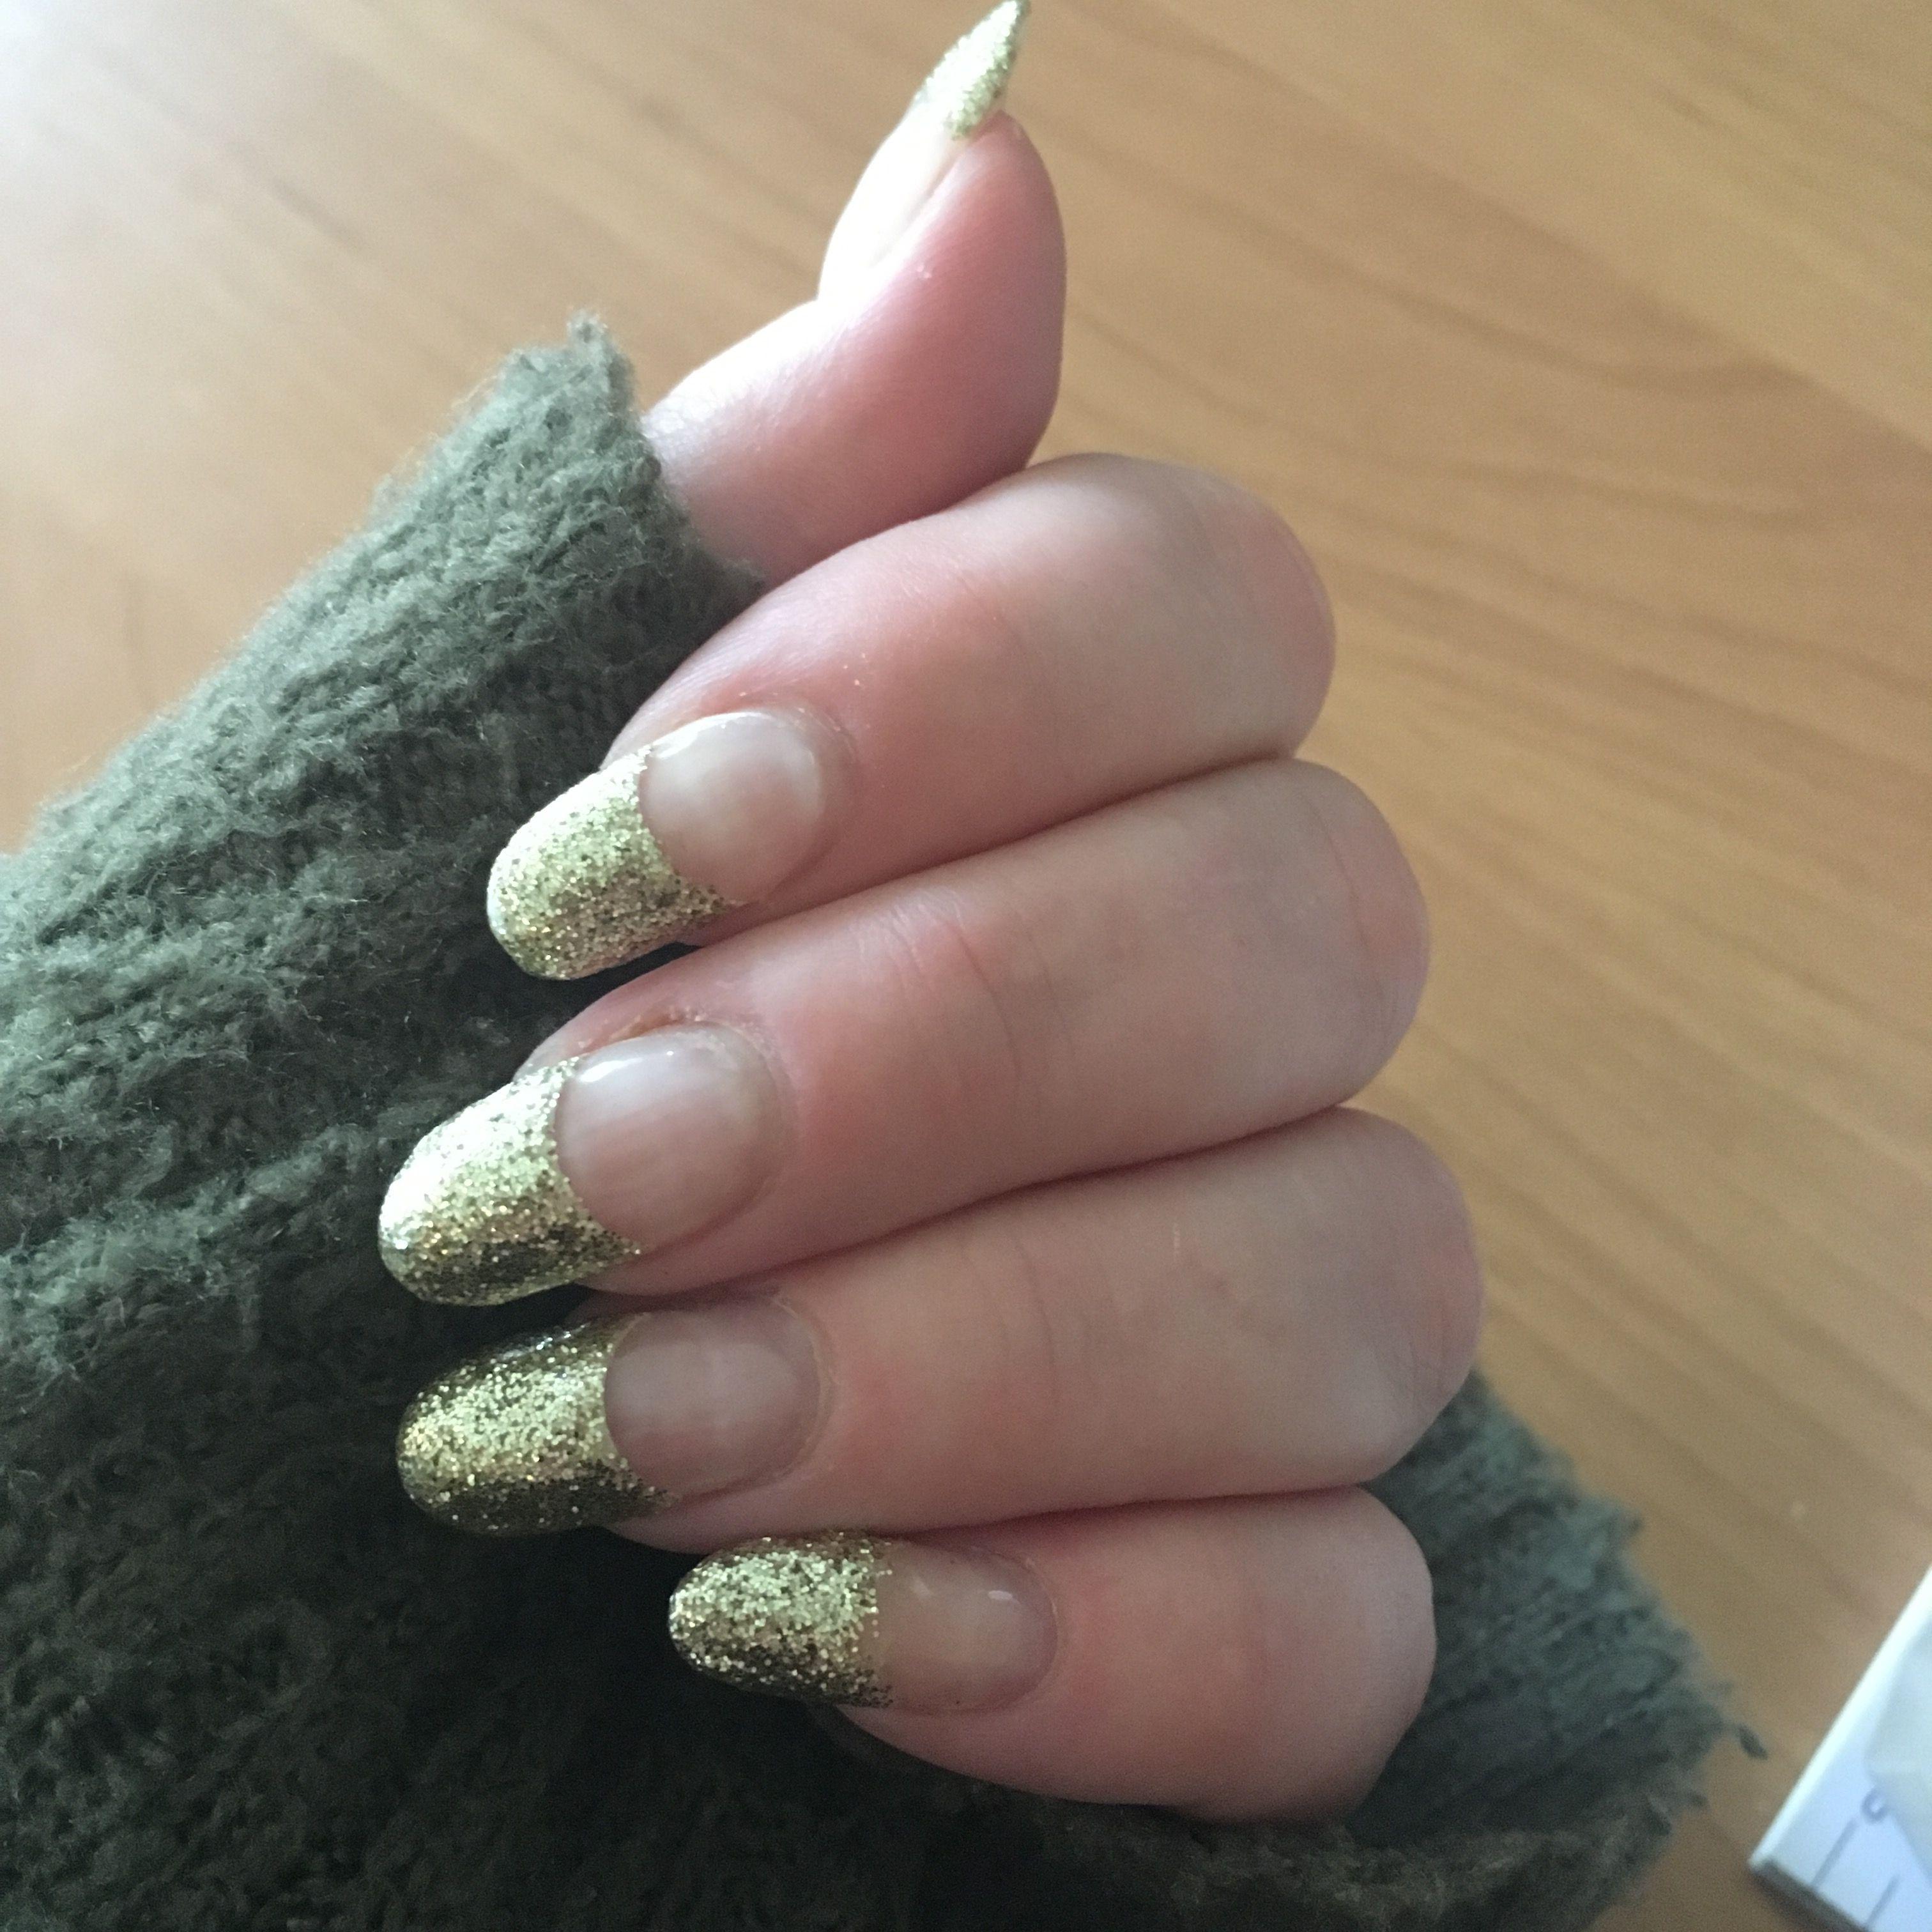 Acryl nagels met gellak goud glitter tips - Nagels | Pinterest ...